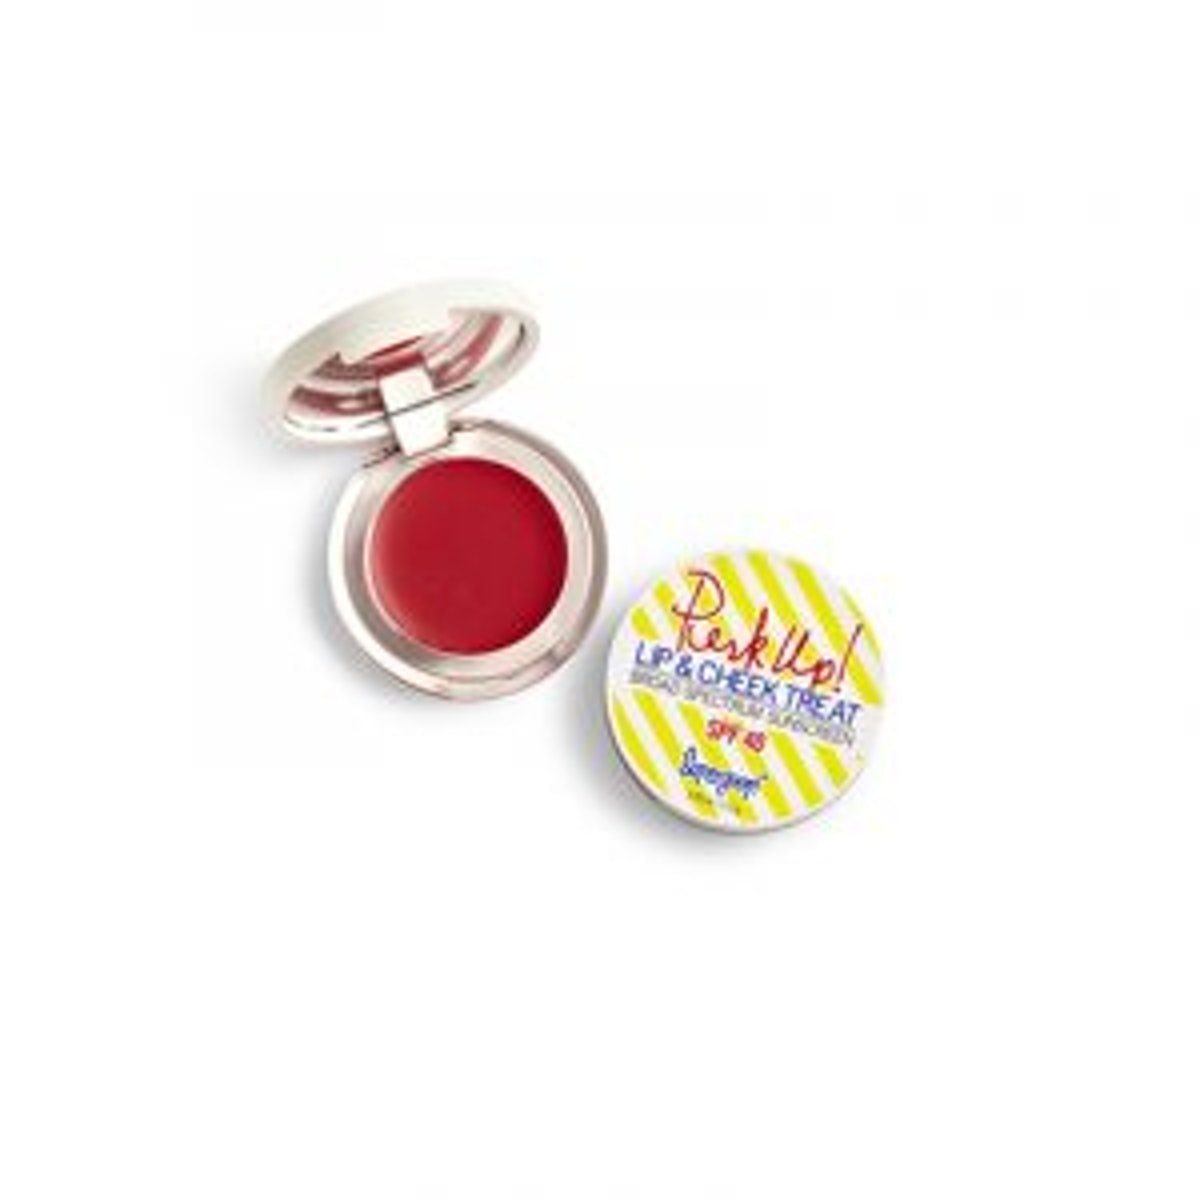 Lip And Cheek Treat SPF 40